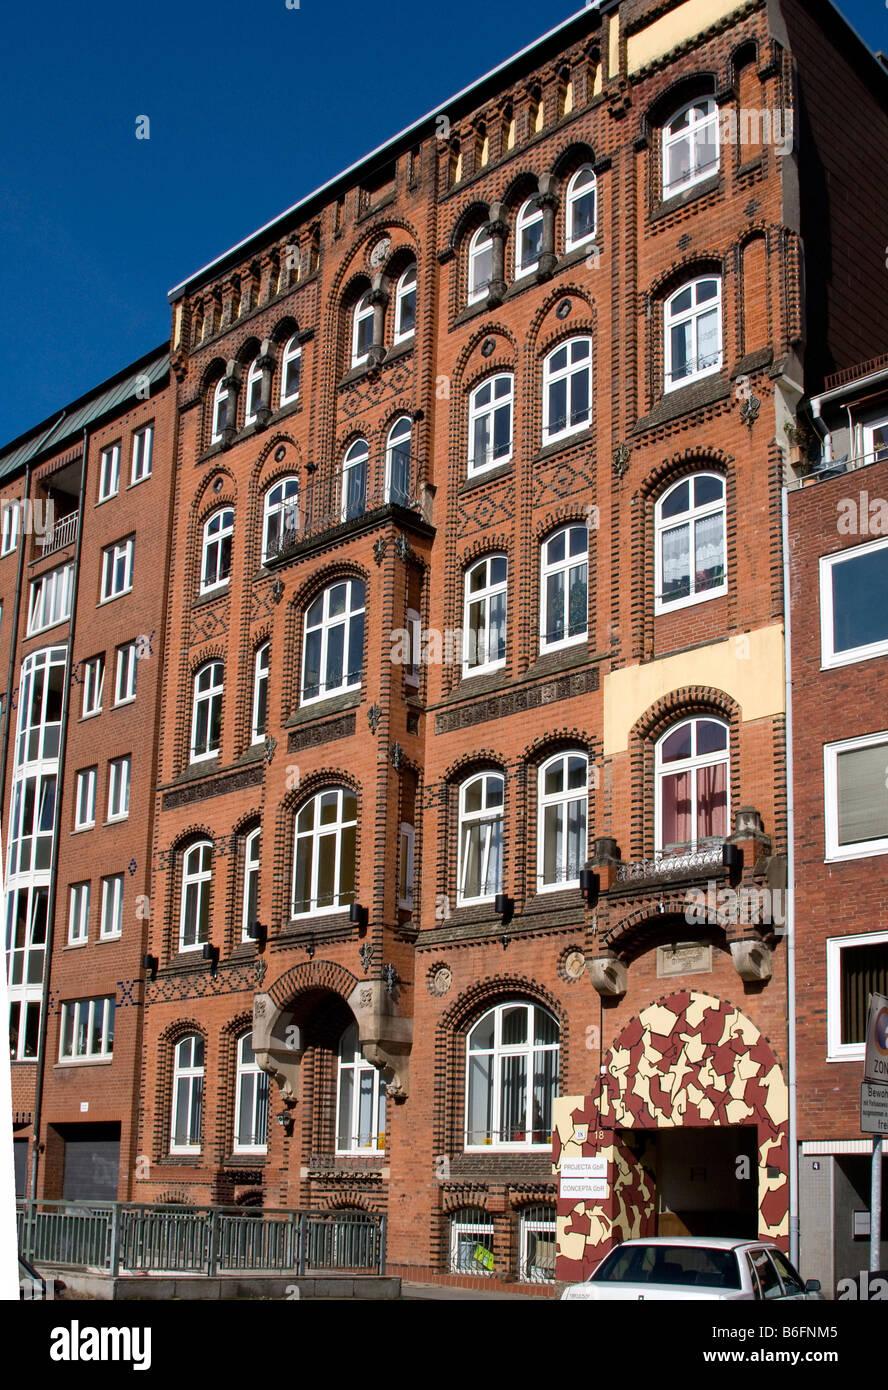 Typical Hamburg brick building, Michaelisstrasse, Hamburg, Germany, Europe - Stock Image